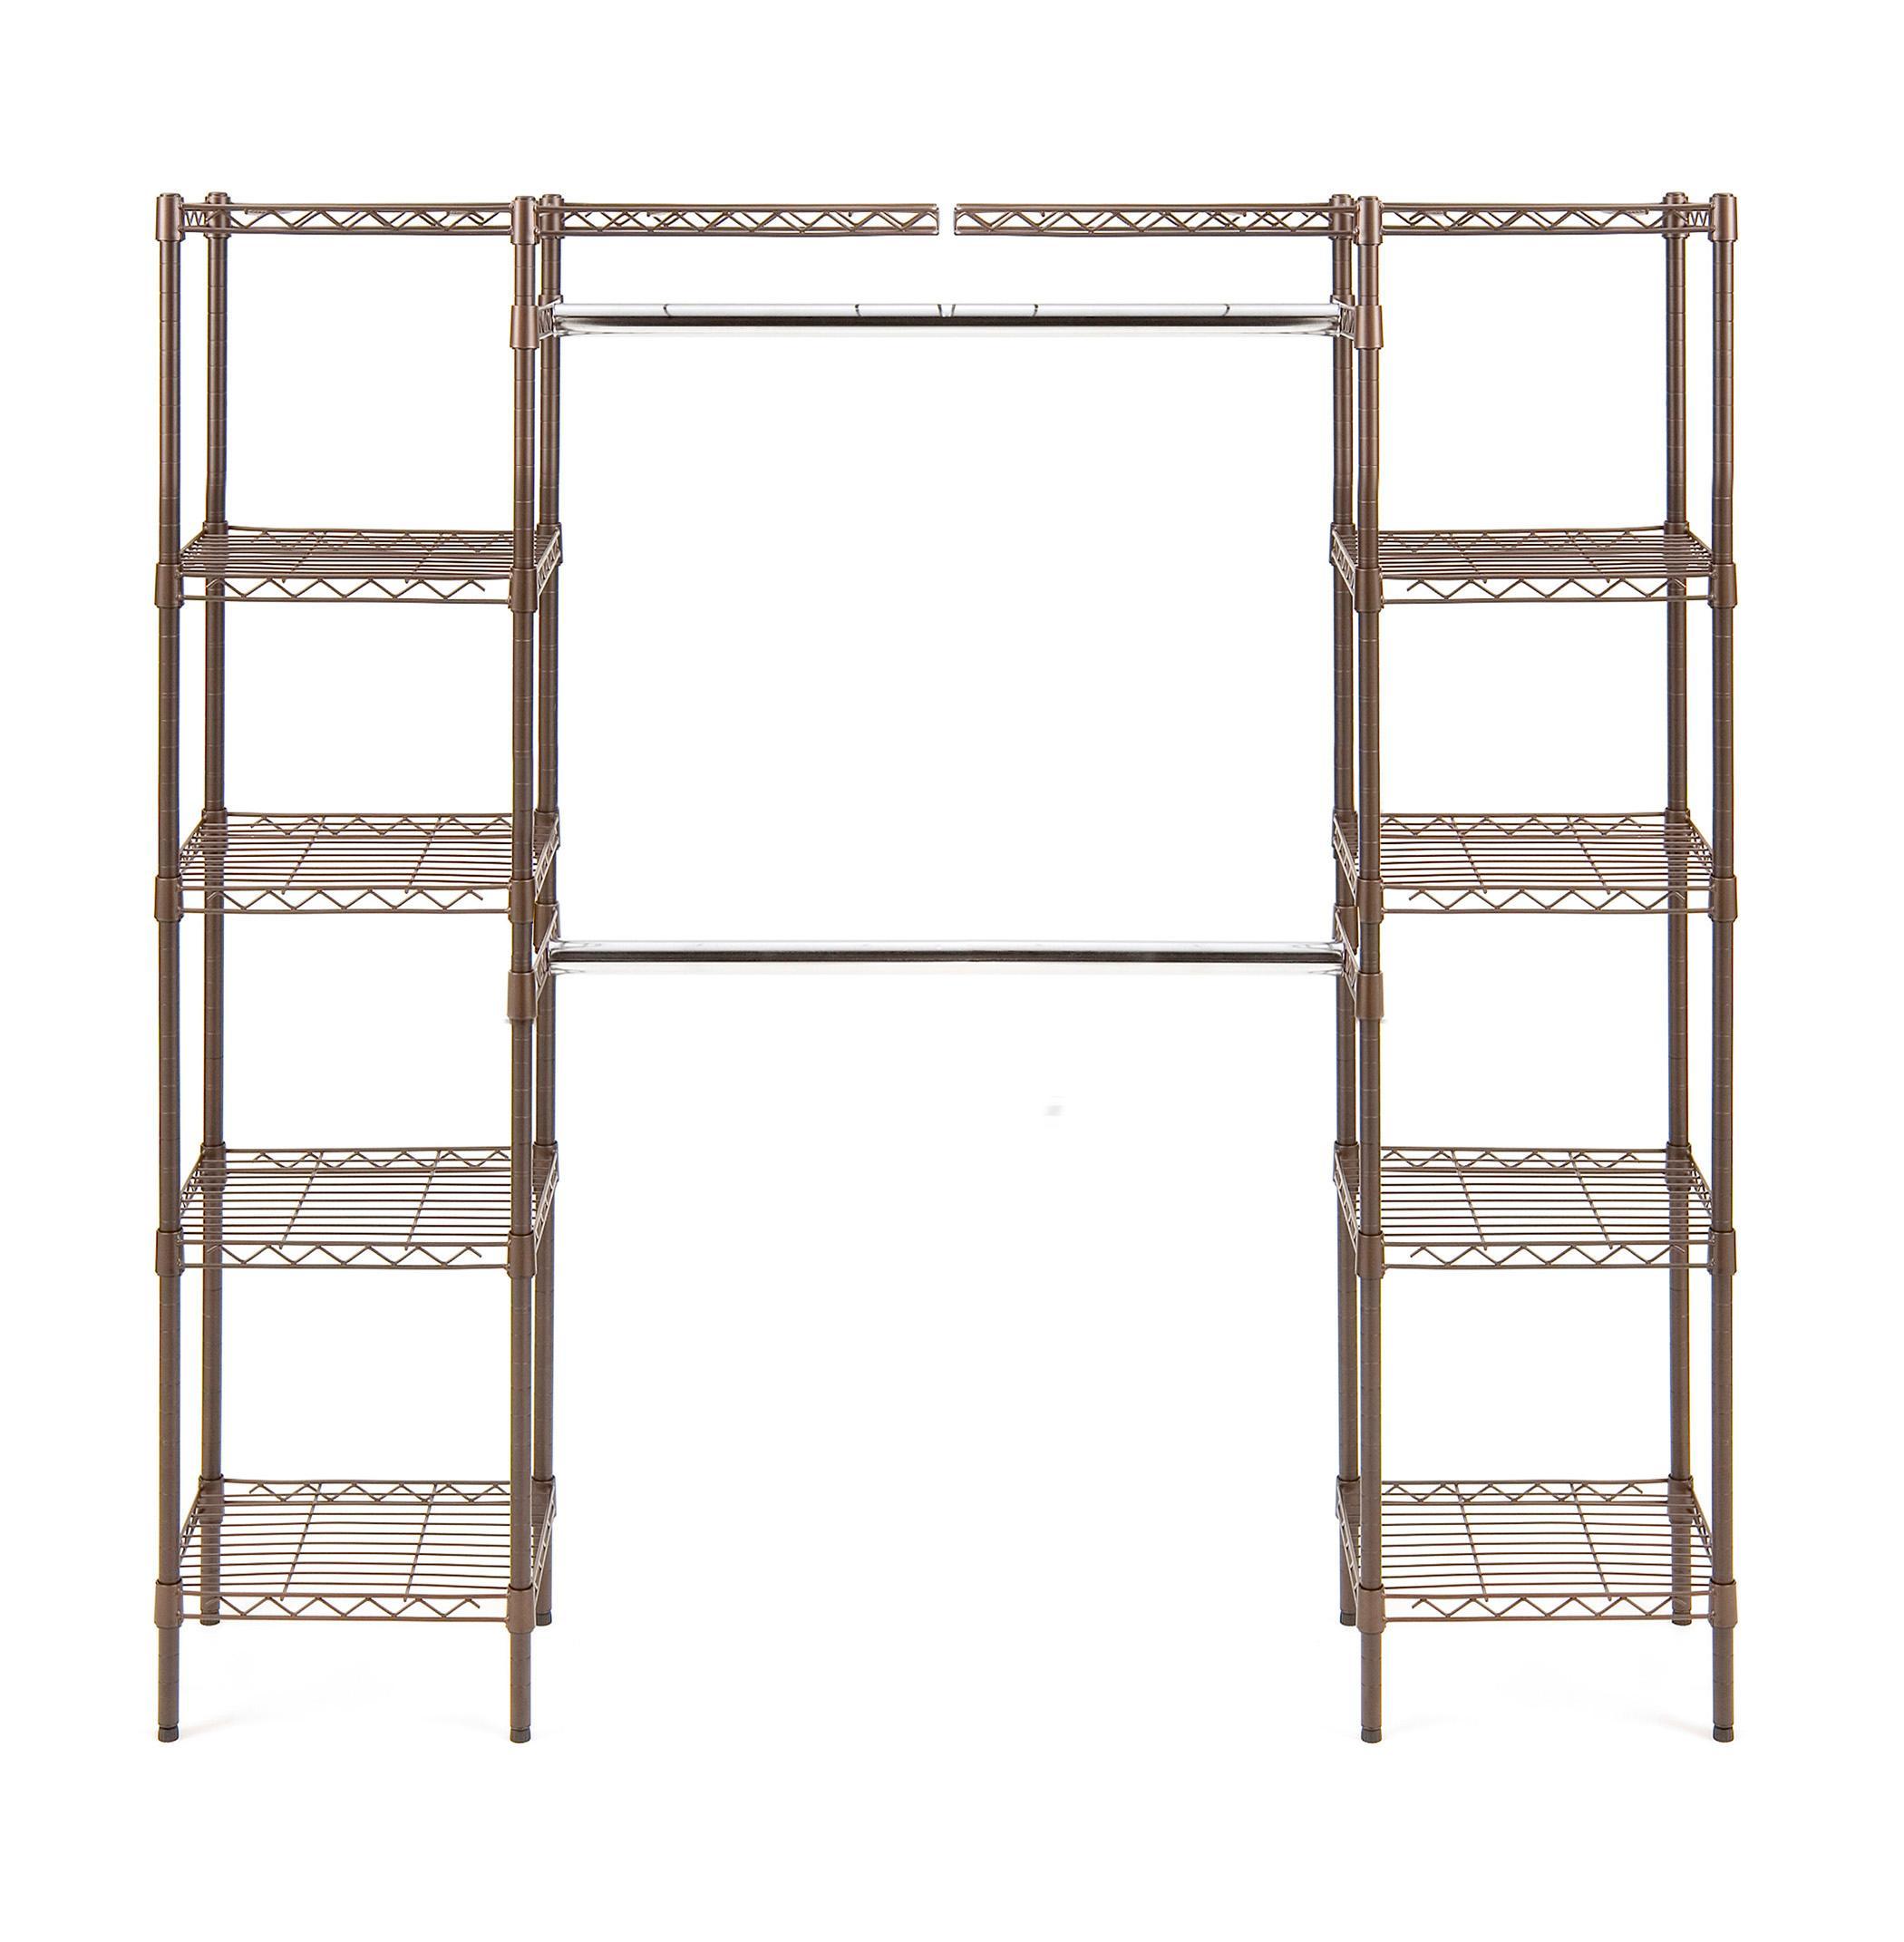 whalen com is storage the seville of menards great system an organizers closet adretcient organizer organization ideal stunning